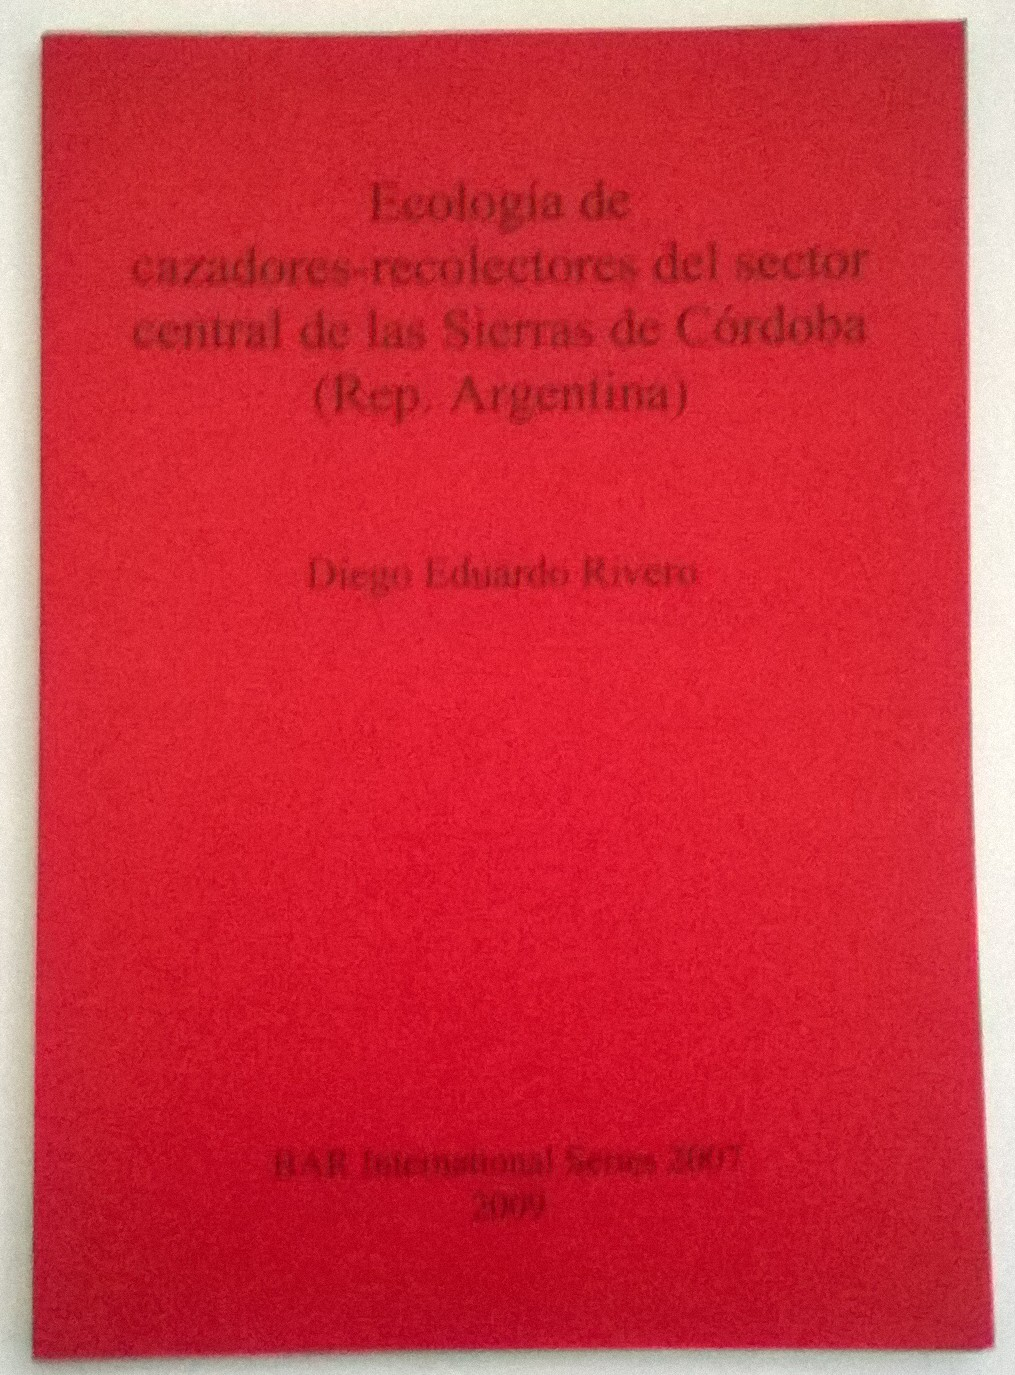 Ecologia de cazadores-recolectores del sector central de las Sierras de Cordoba (Rep. Argentina) :BAR International Publishing, Diego Eduardo Rivero ;